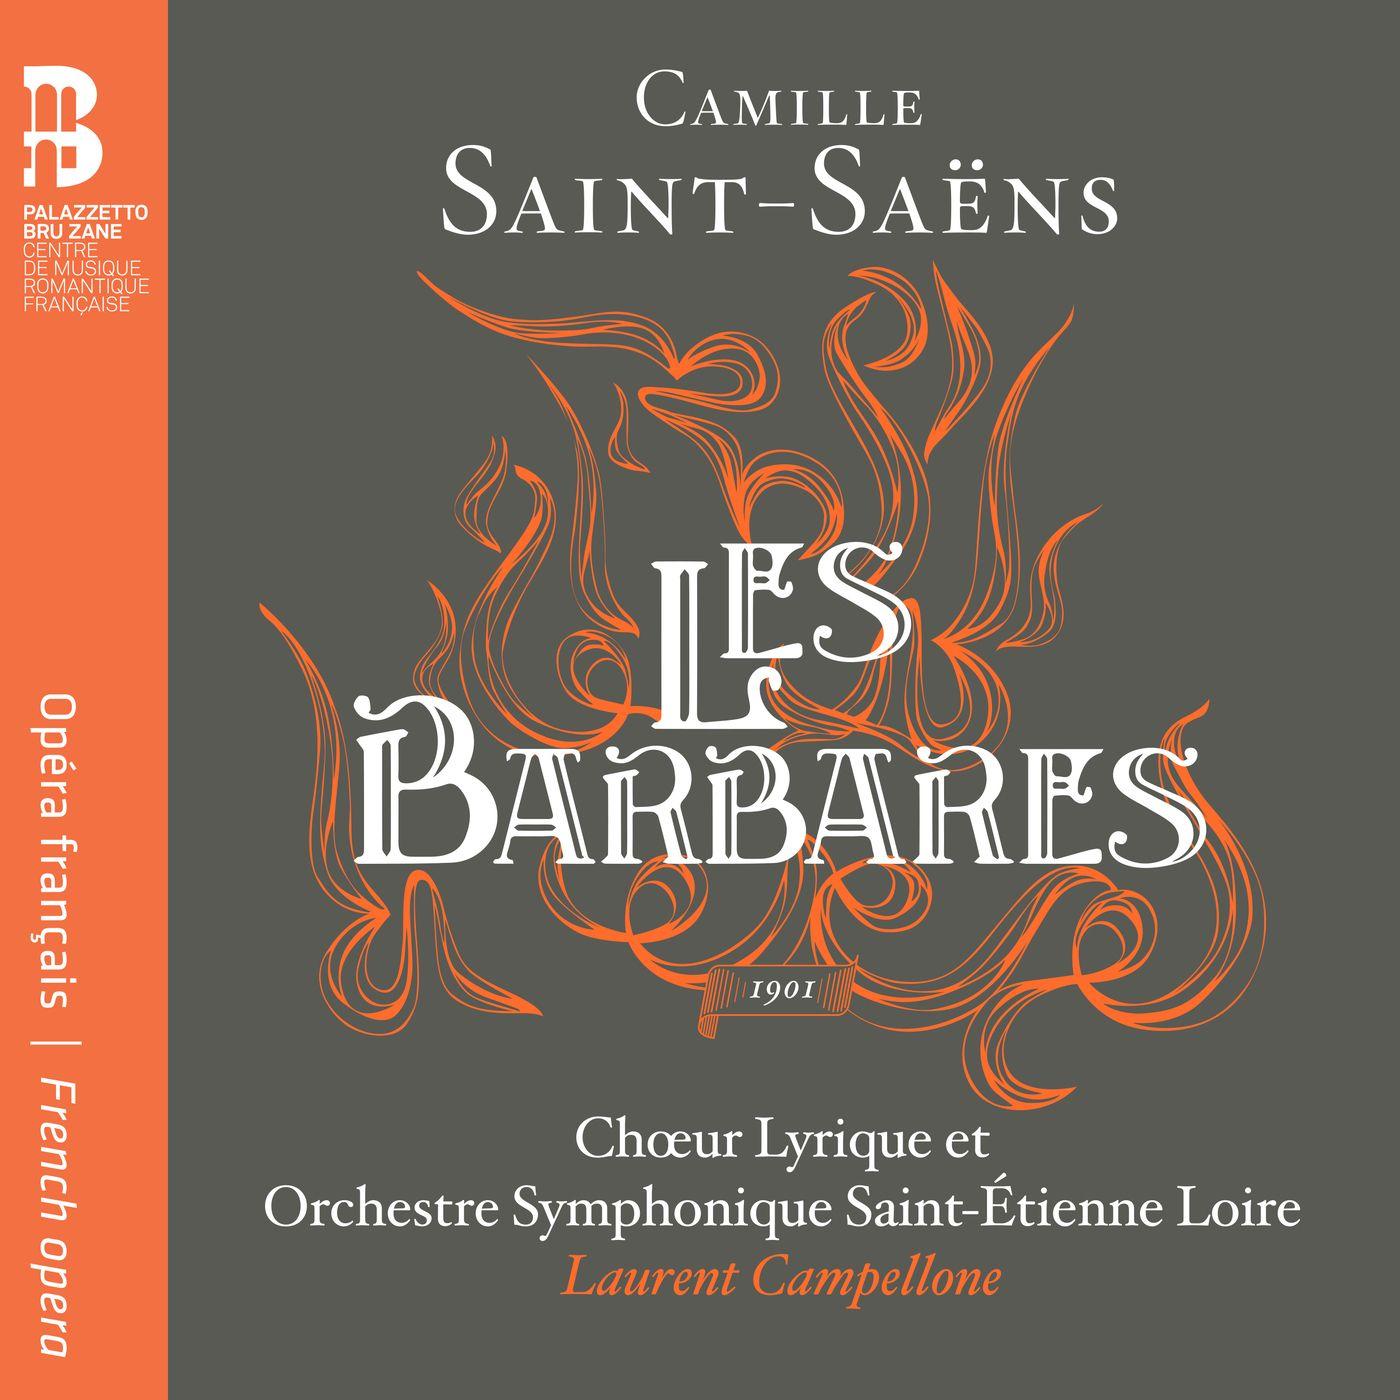 Saint-Saëns: Les Barbares